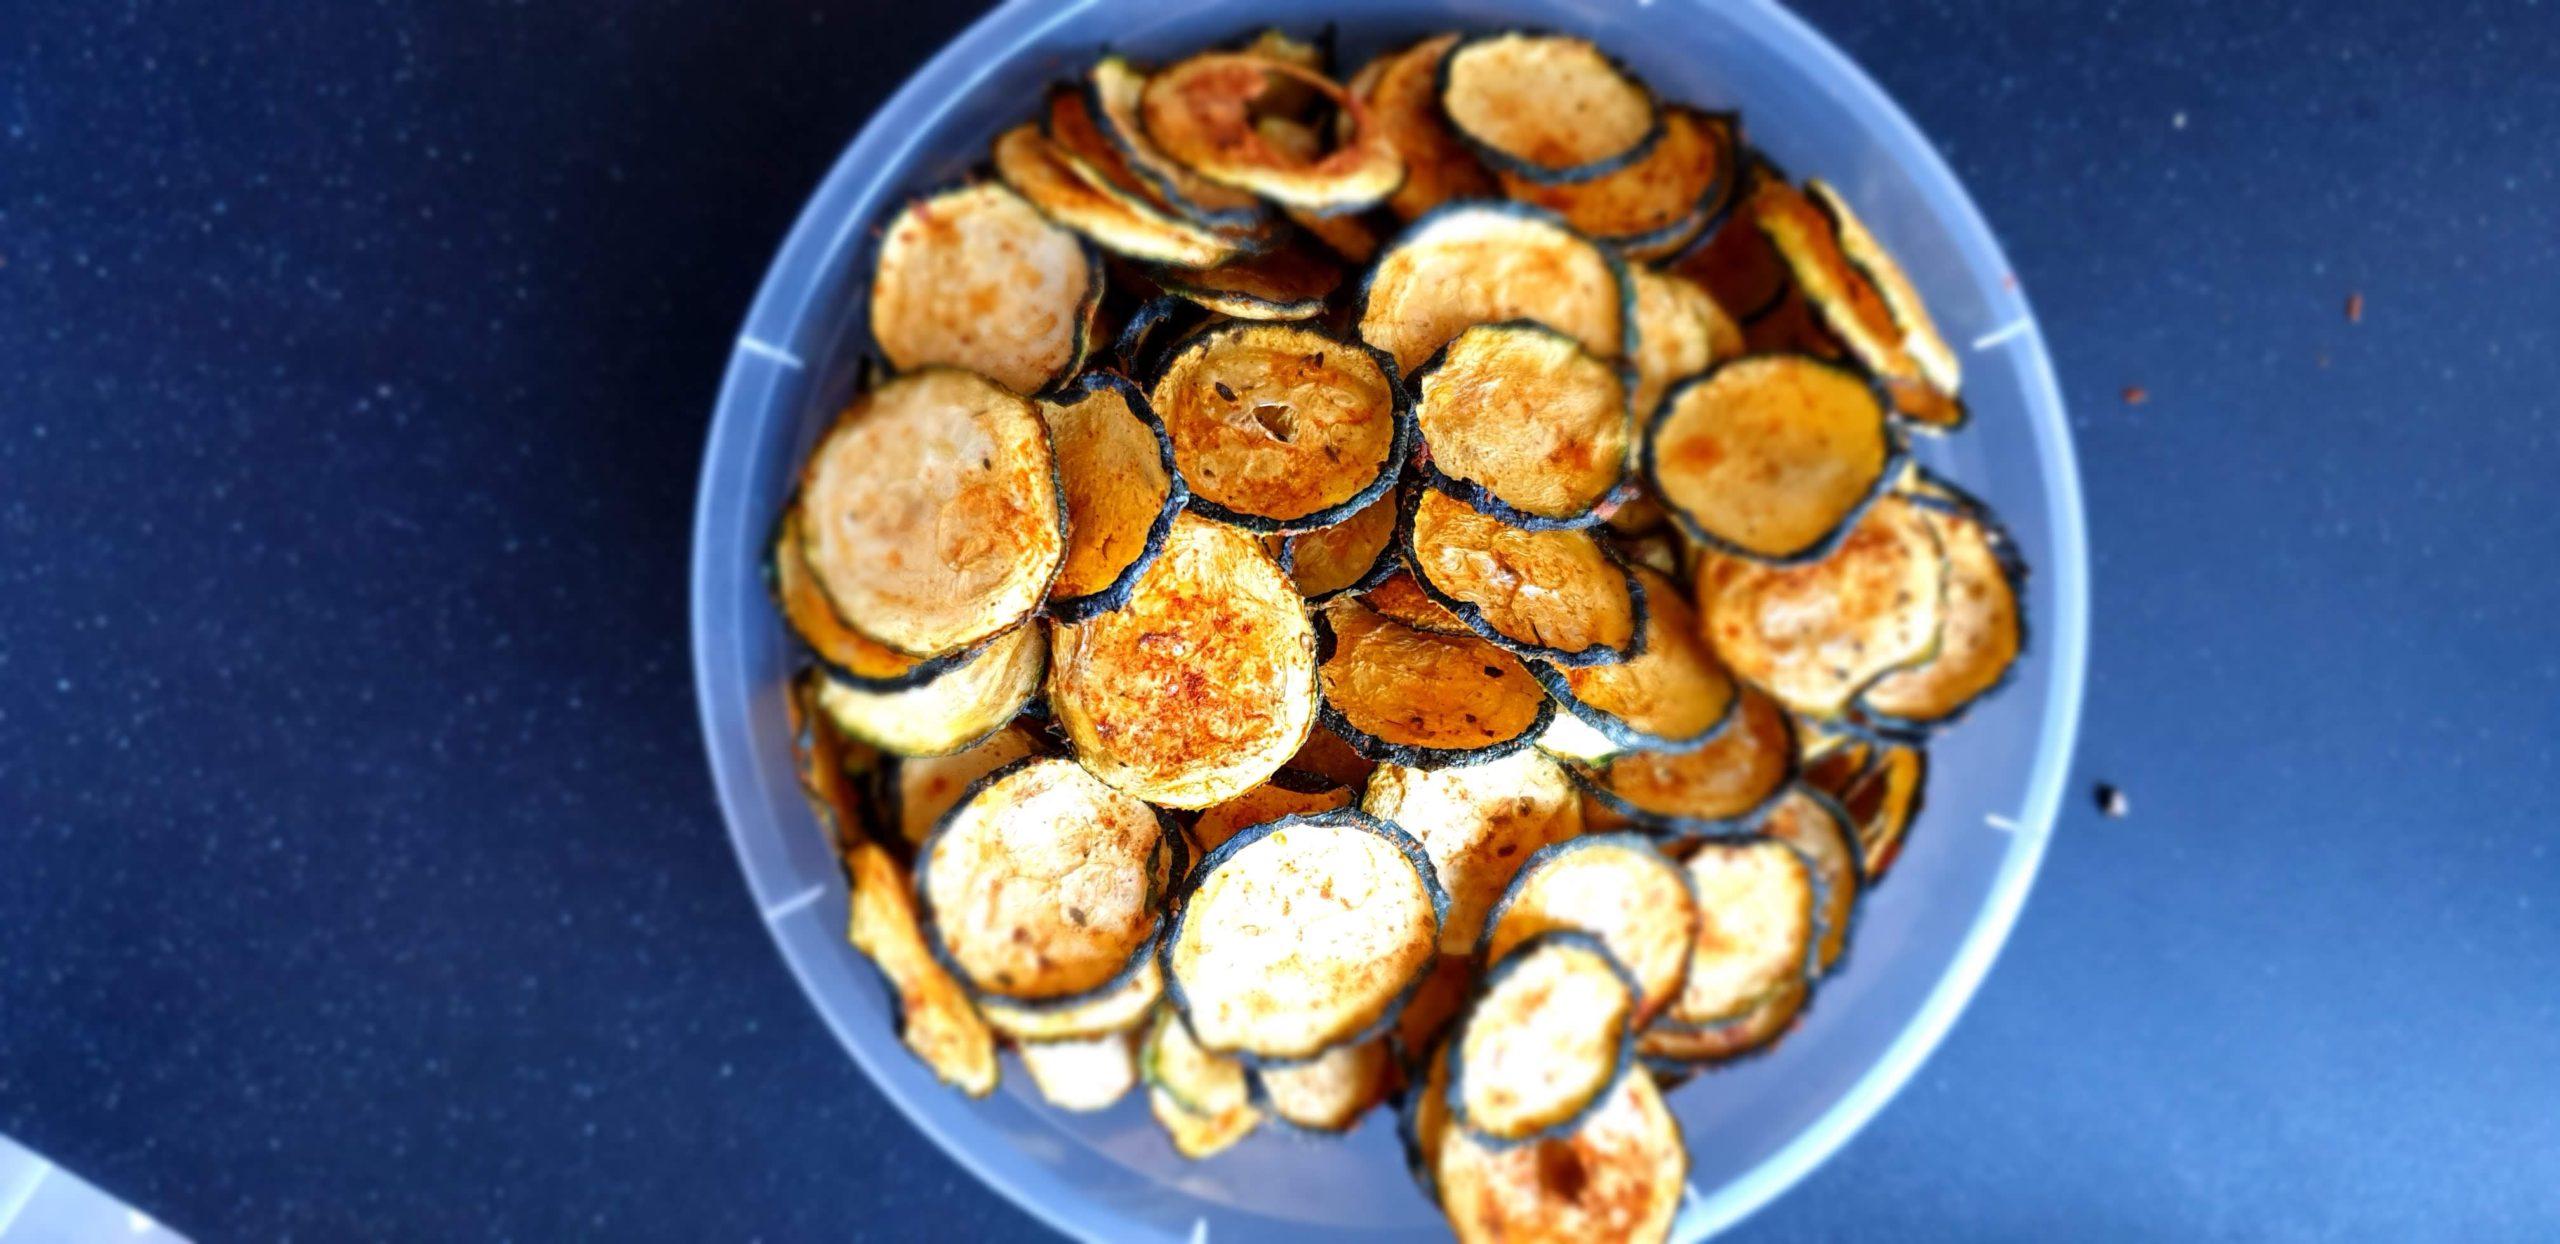 Gluten Free Zucchini Chips